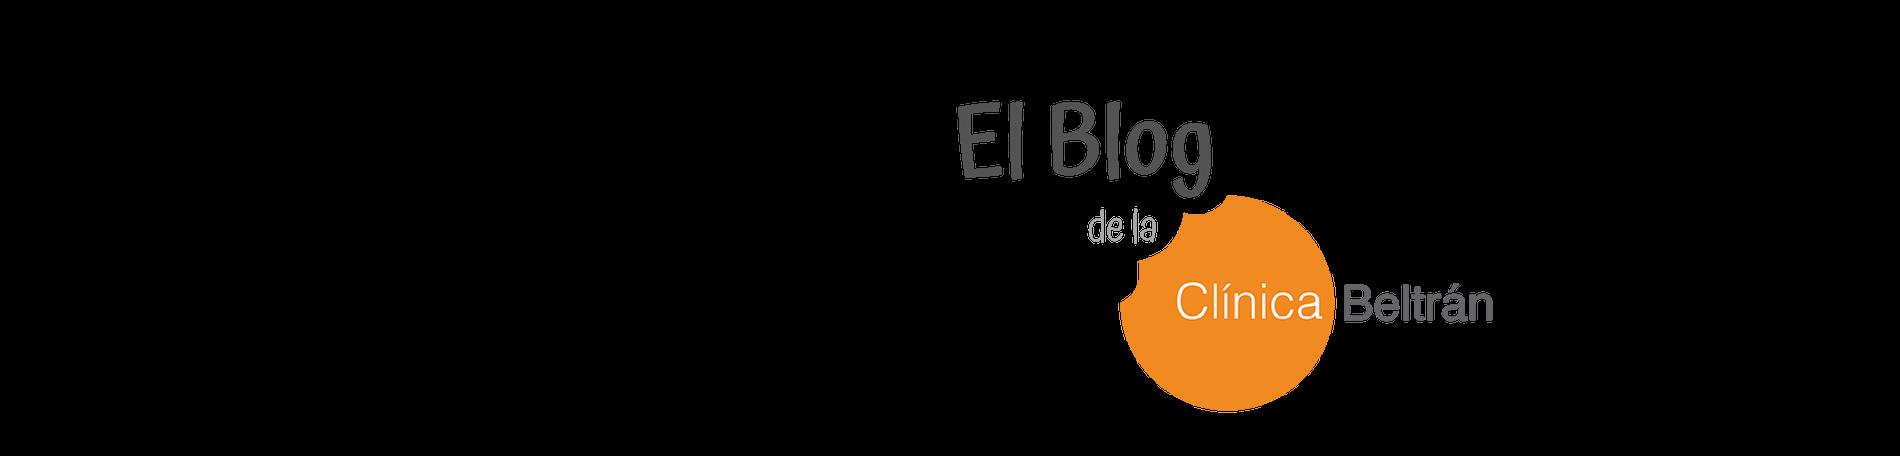 el blog de Clinica Beltrán